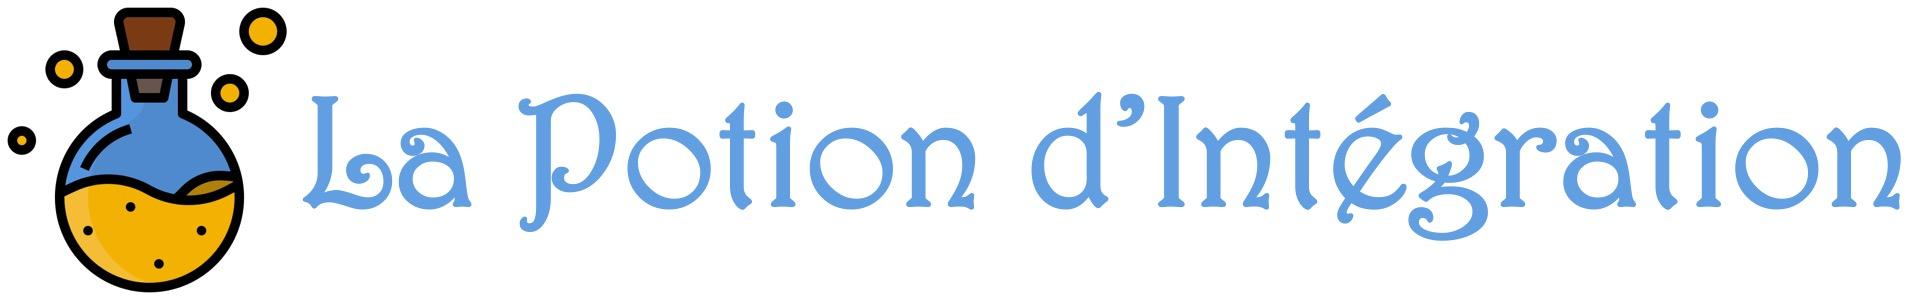 potiondintegration